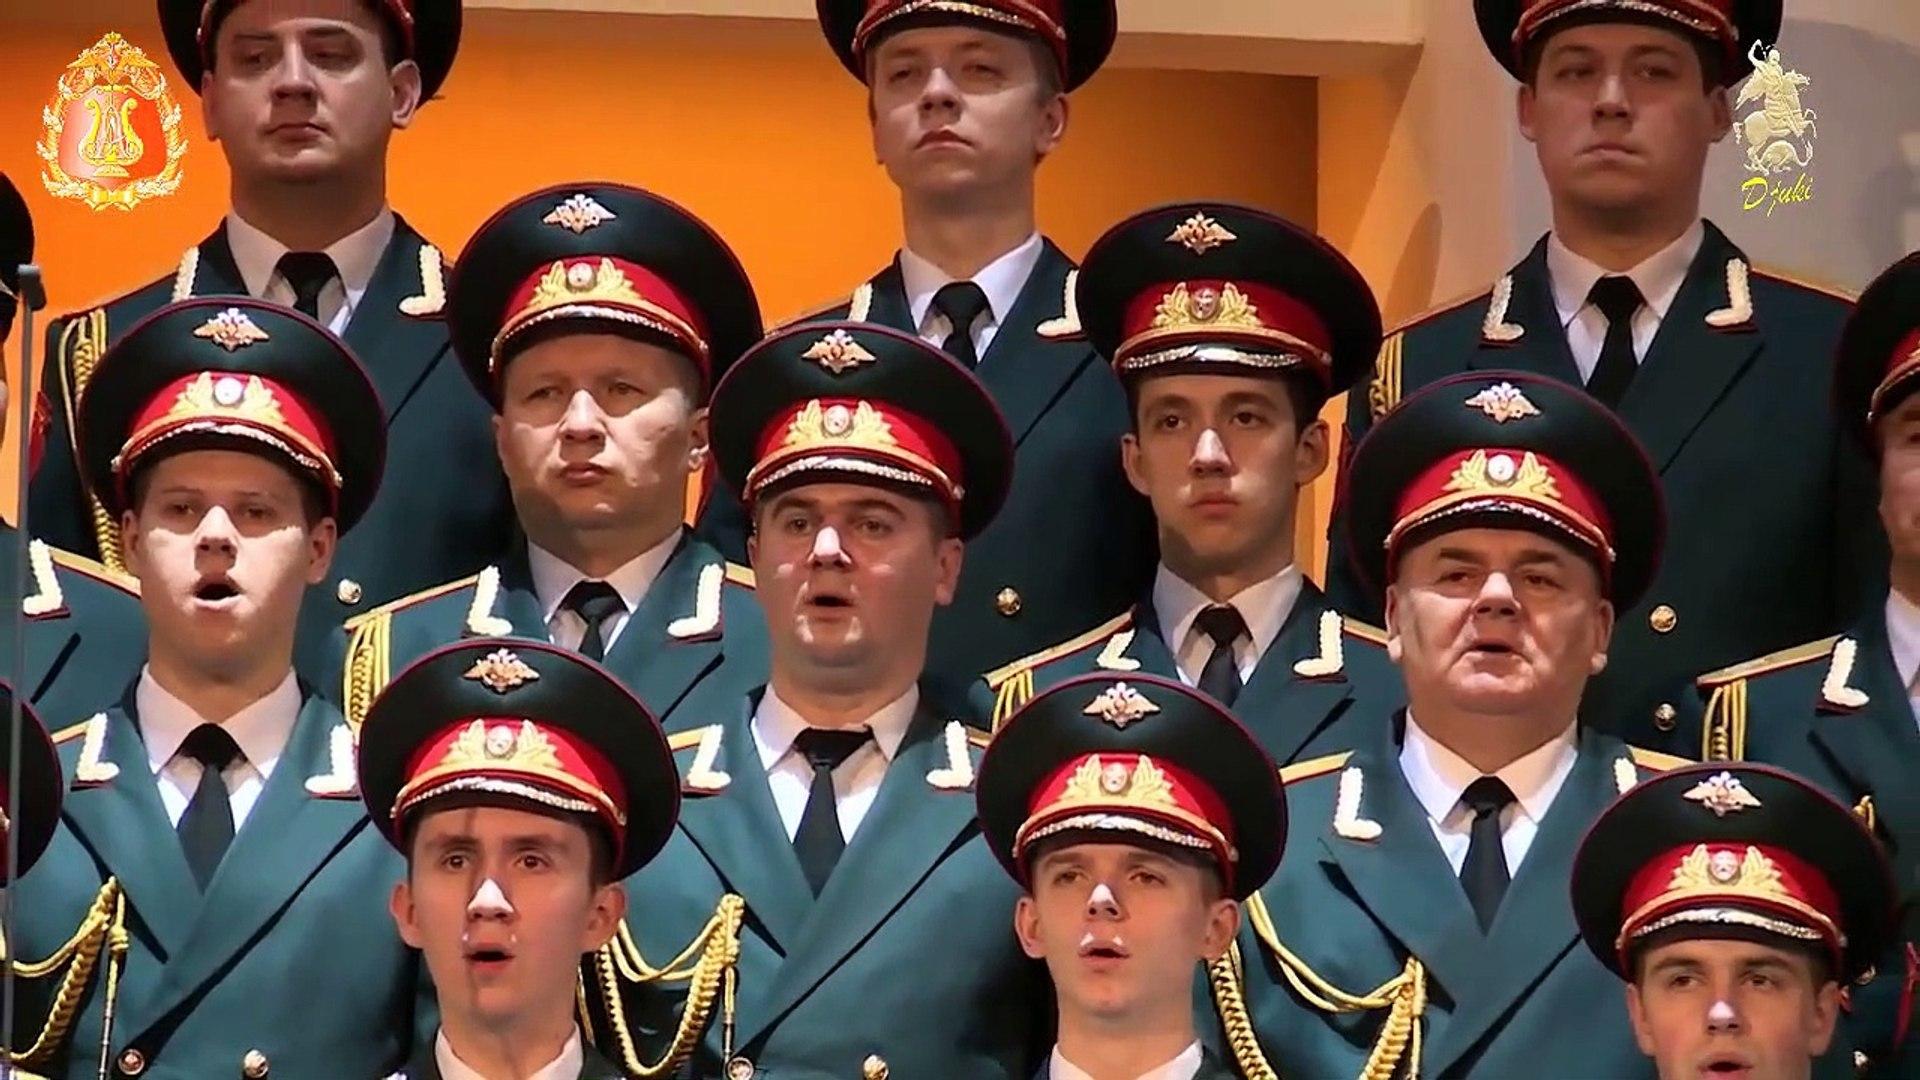 Баллада о солдате (Ballad of a Soldier) - Alexandrov Ensemble (2019)